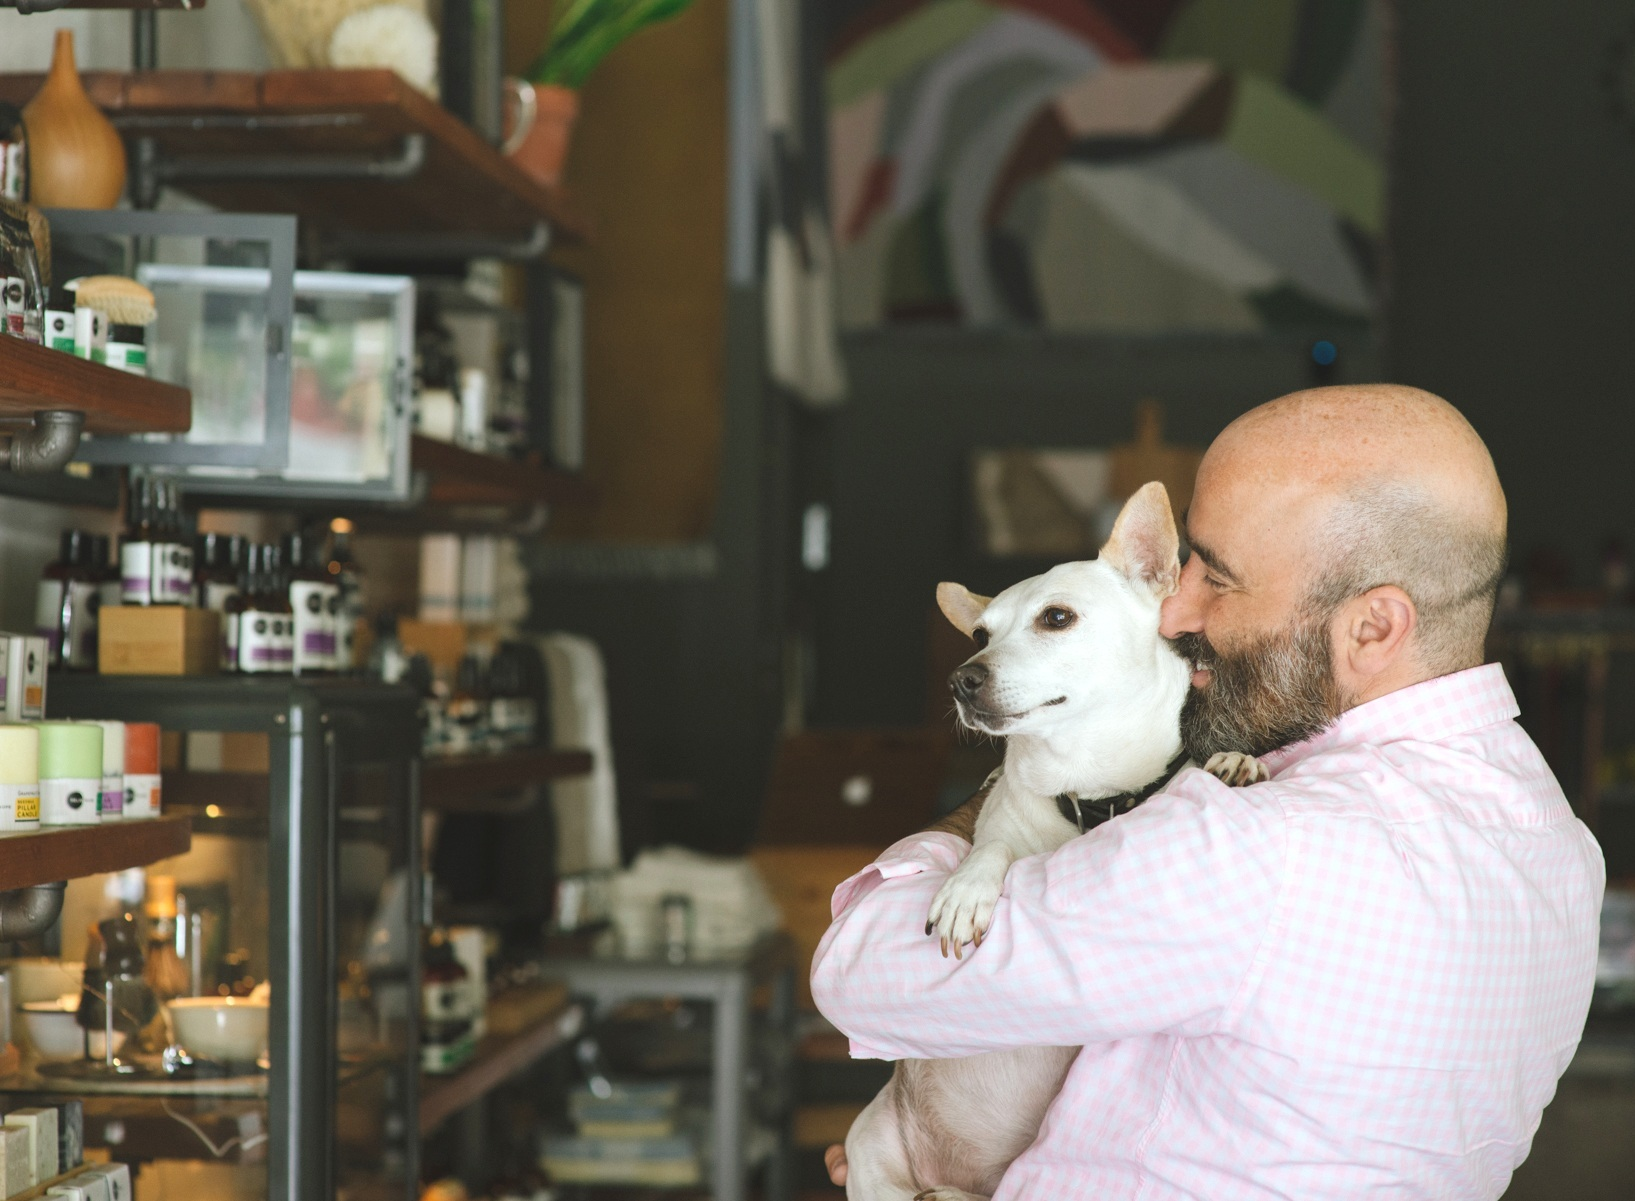 Jonathan Plotzker-Kelly, Founder of Heliotrope - with his dog, Laika (Photo Credit: Michael Joy Photography)